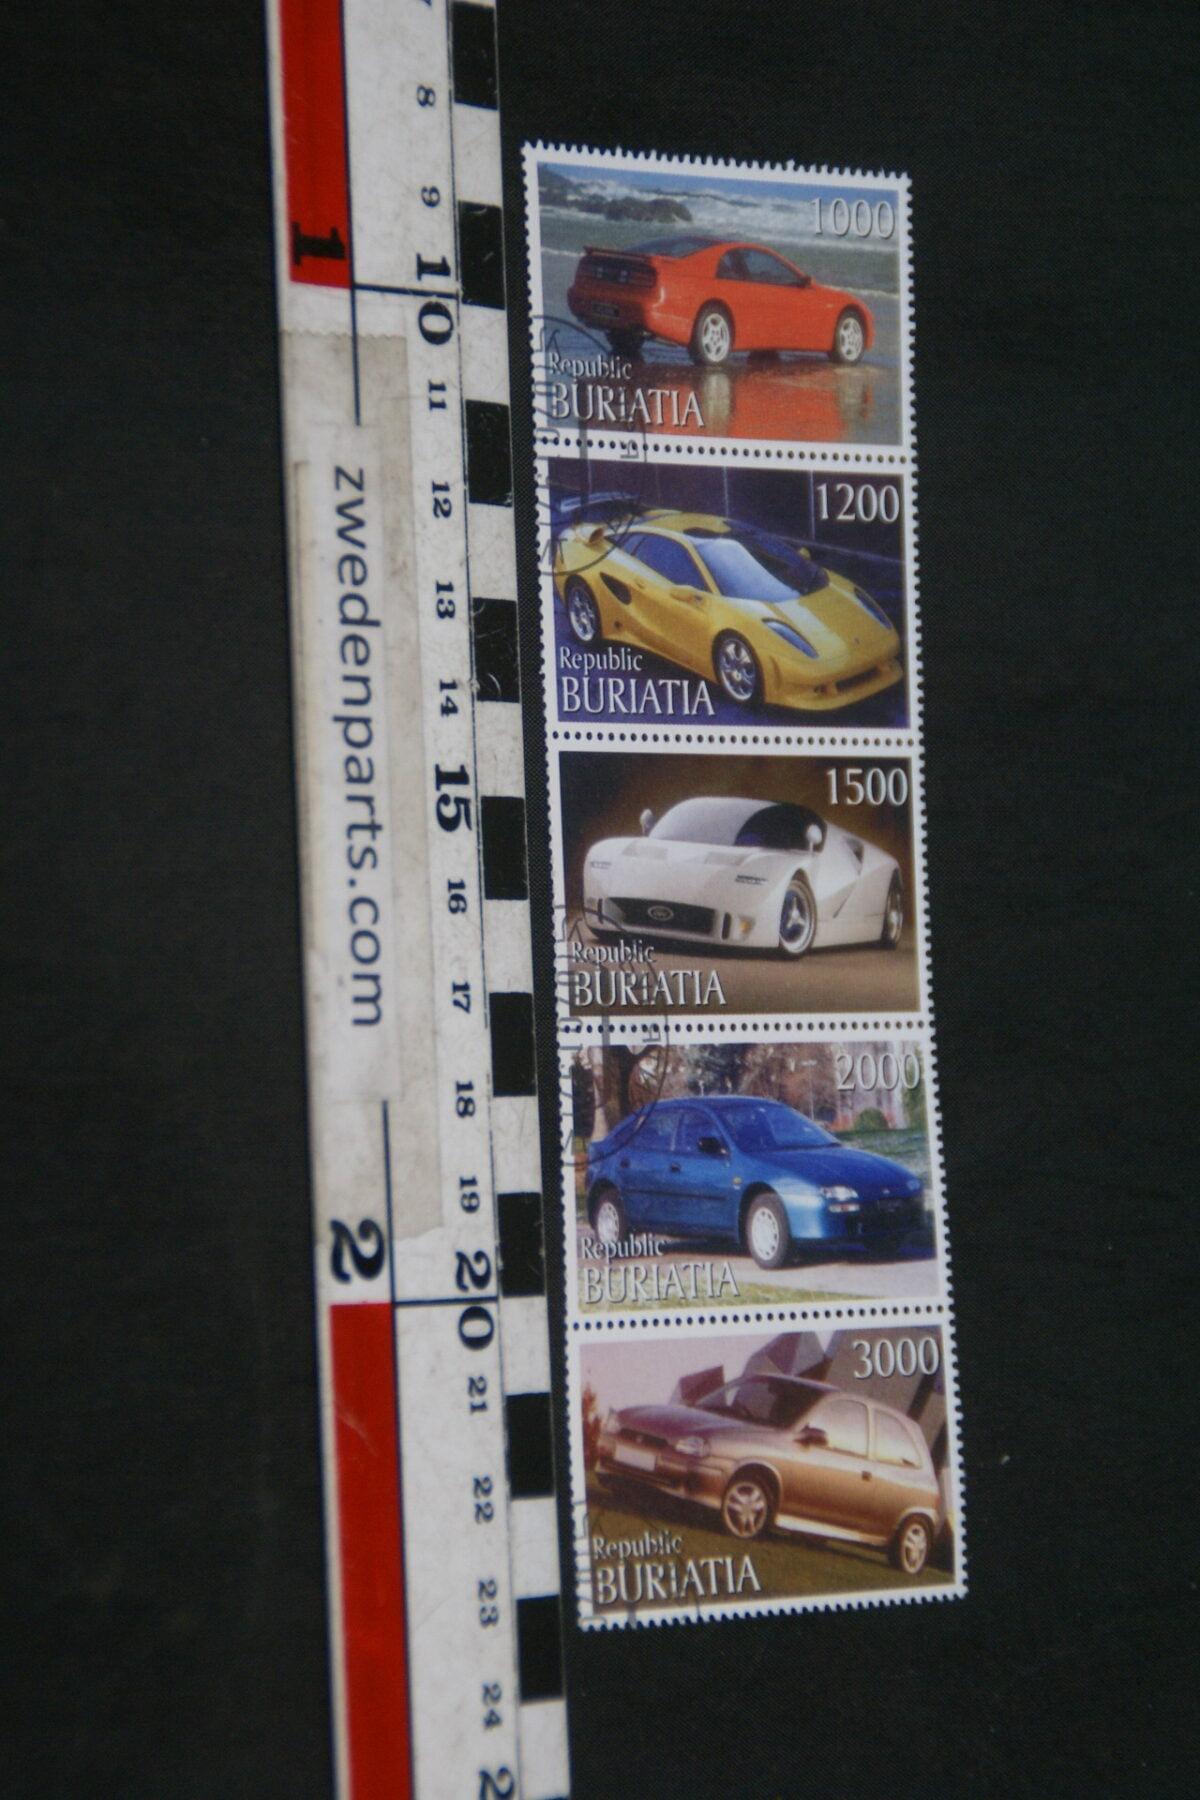 DSC02385 autopostzegels serie van 5, Republiek Buratia-51ec21c3